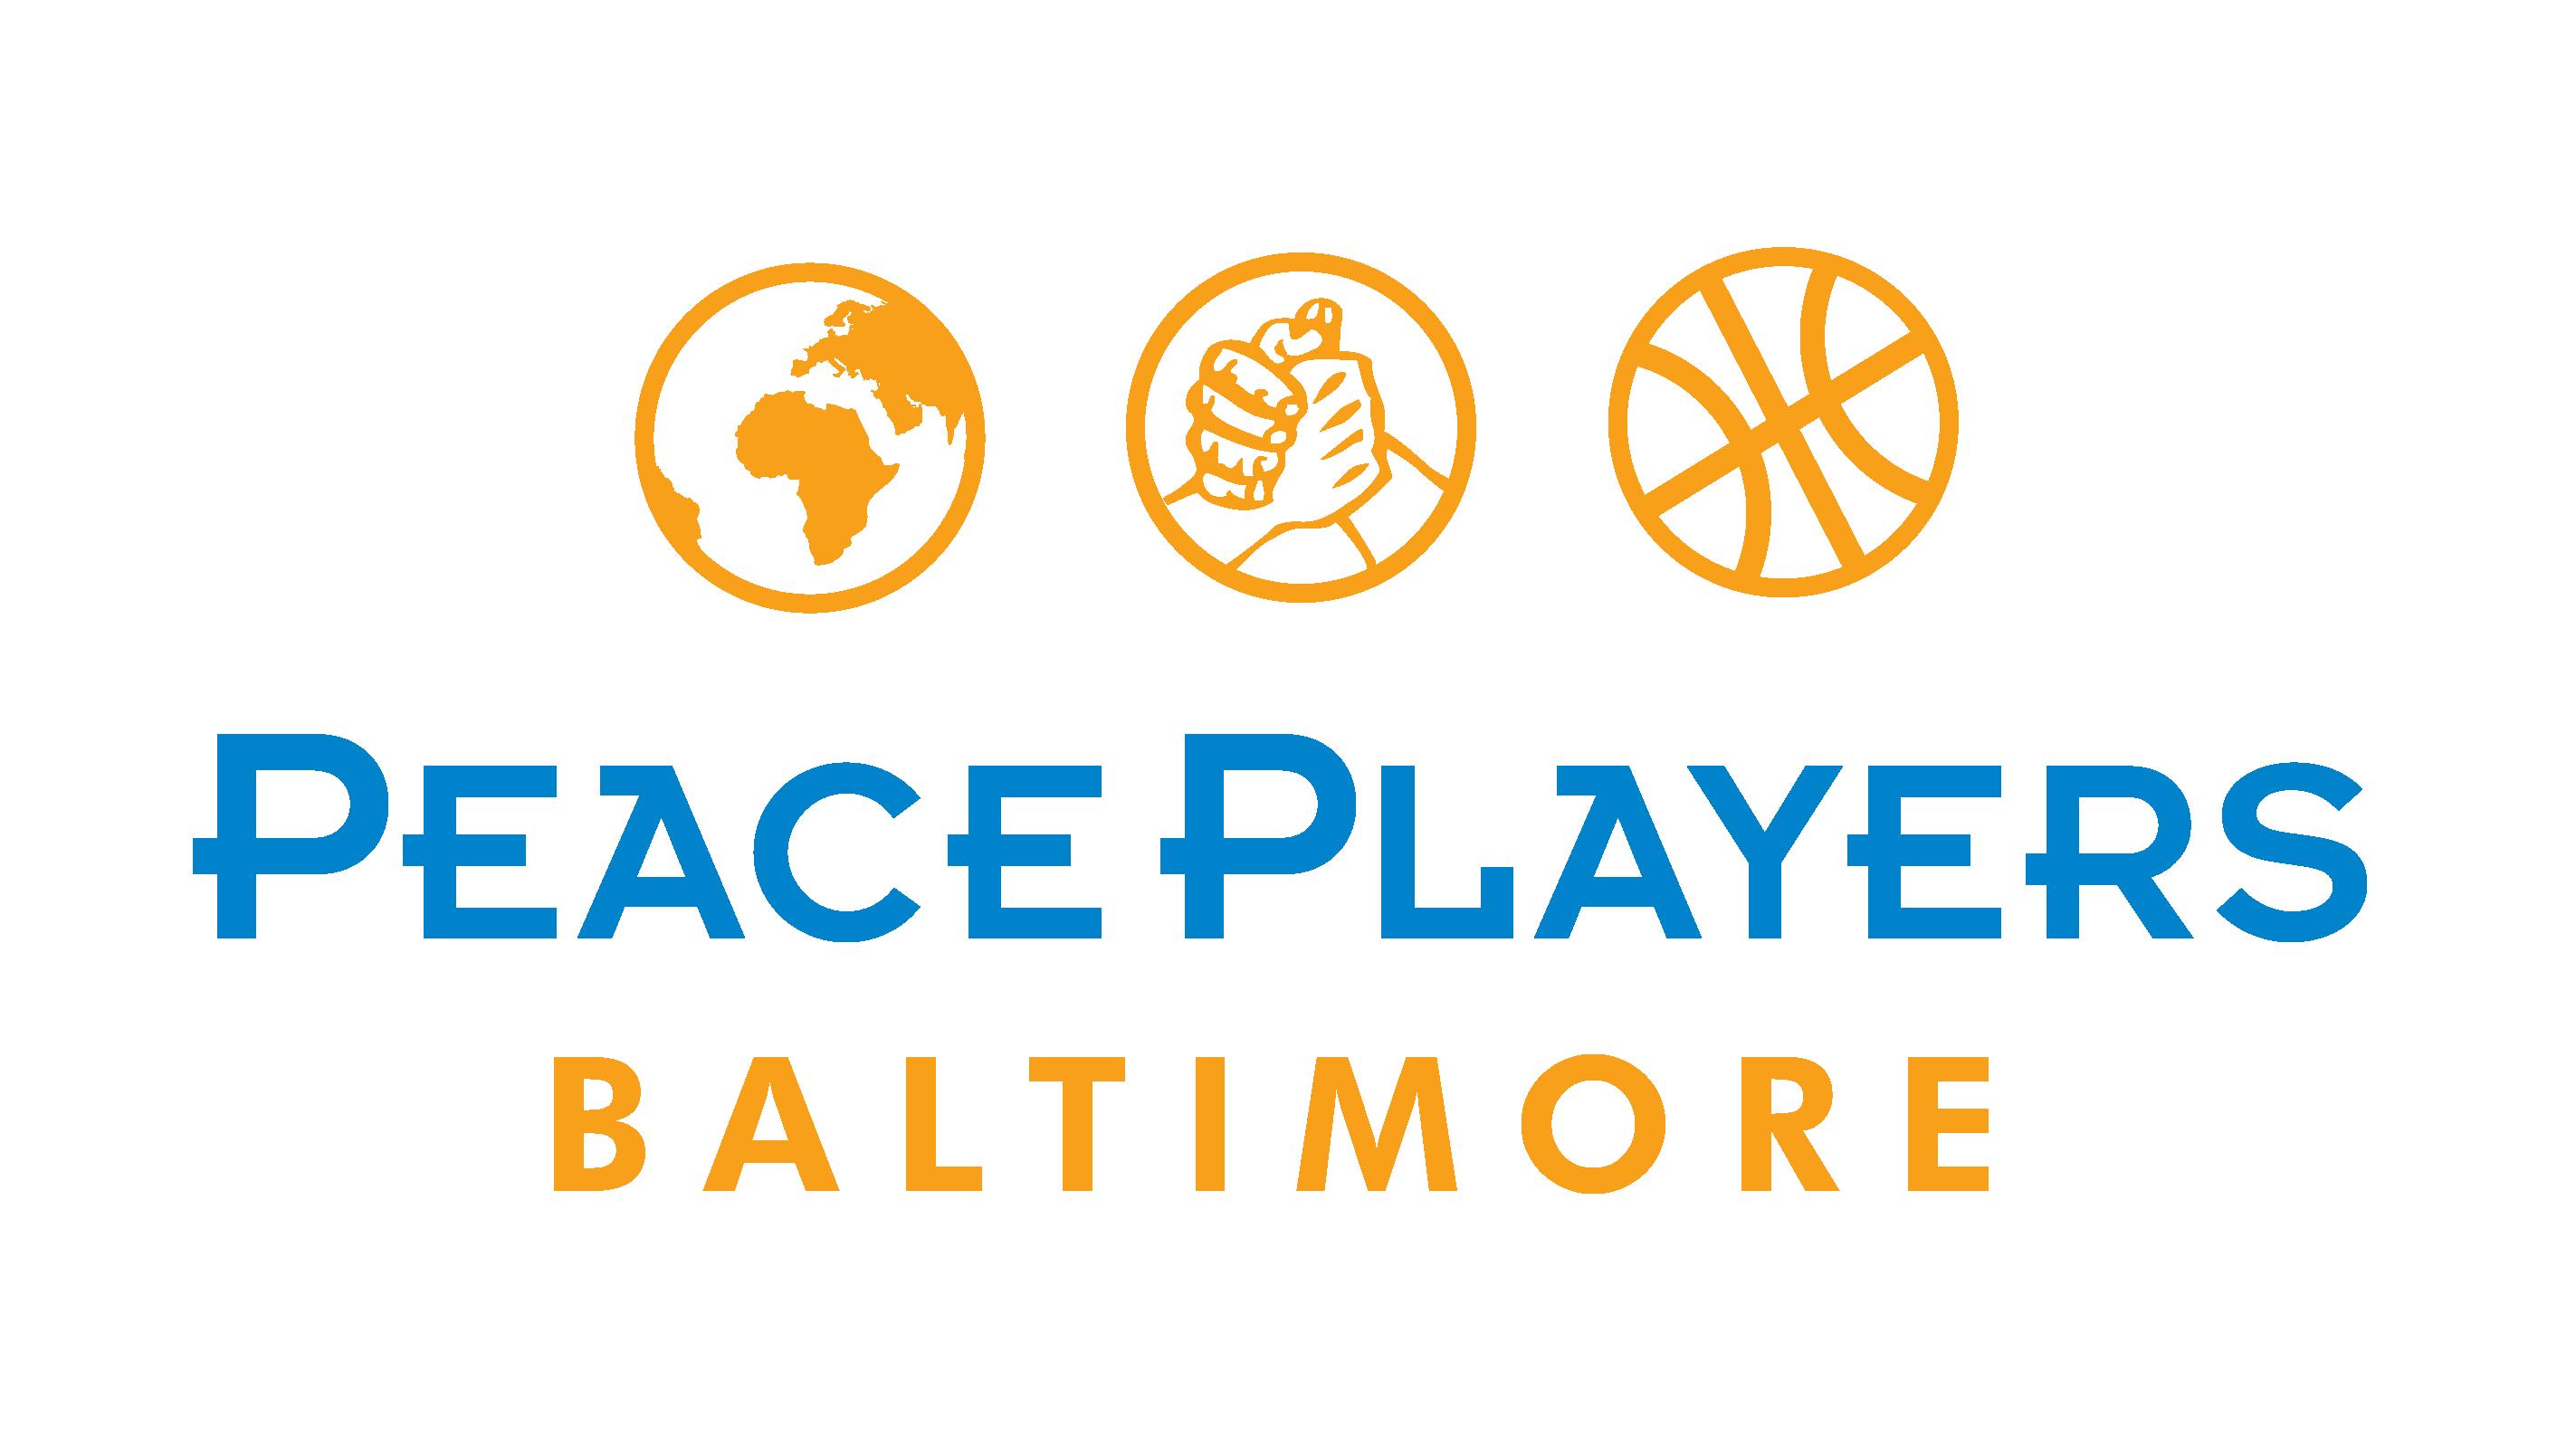 PeacePlayers Baltimore Logo